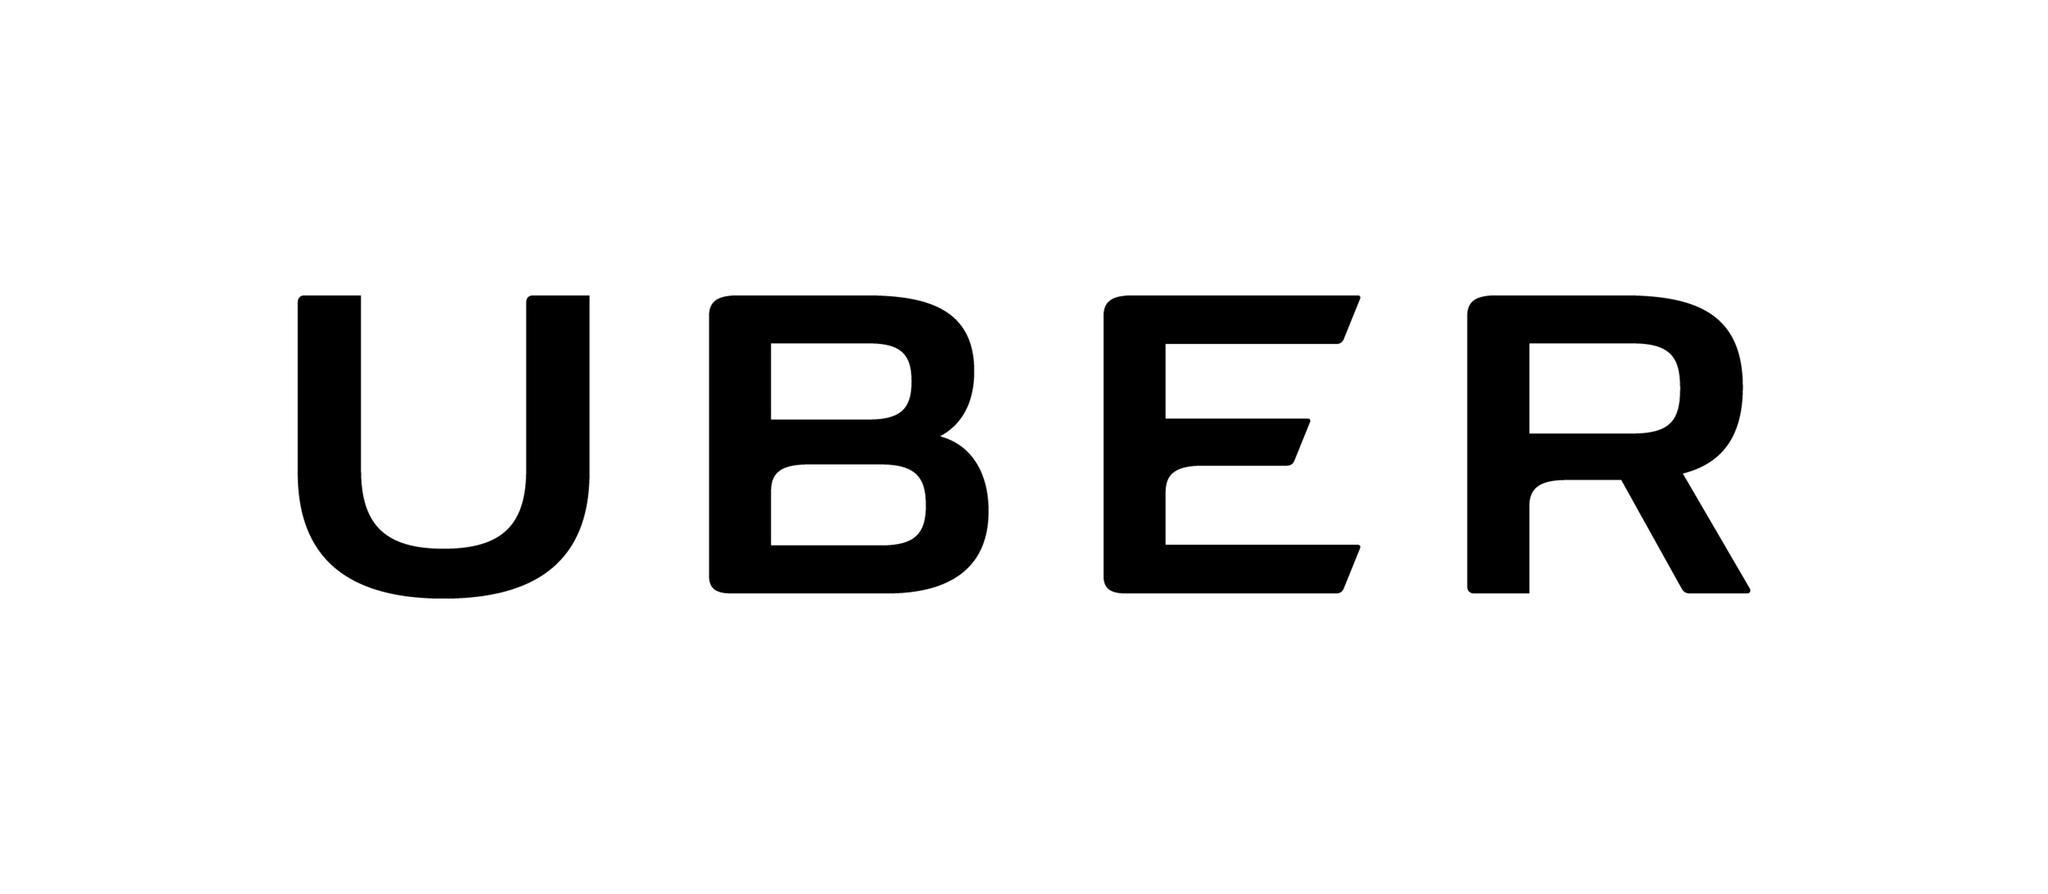 Uber Names Former Orbitz Chief Barney Harford As Operating Officer